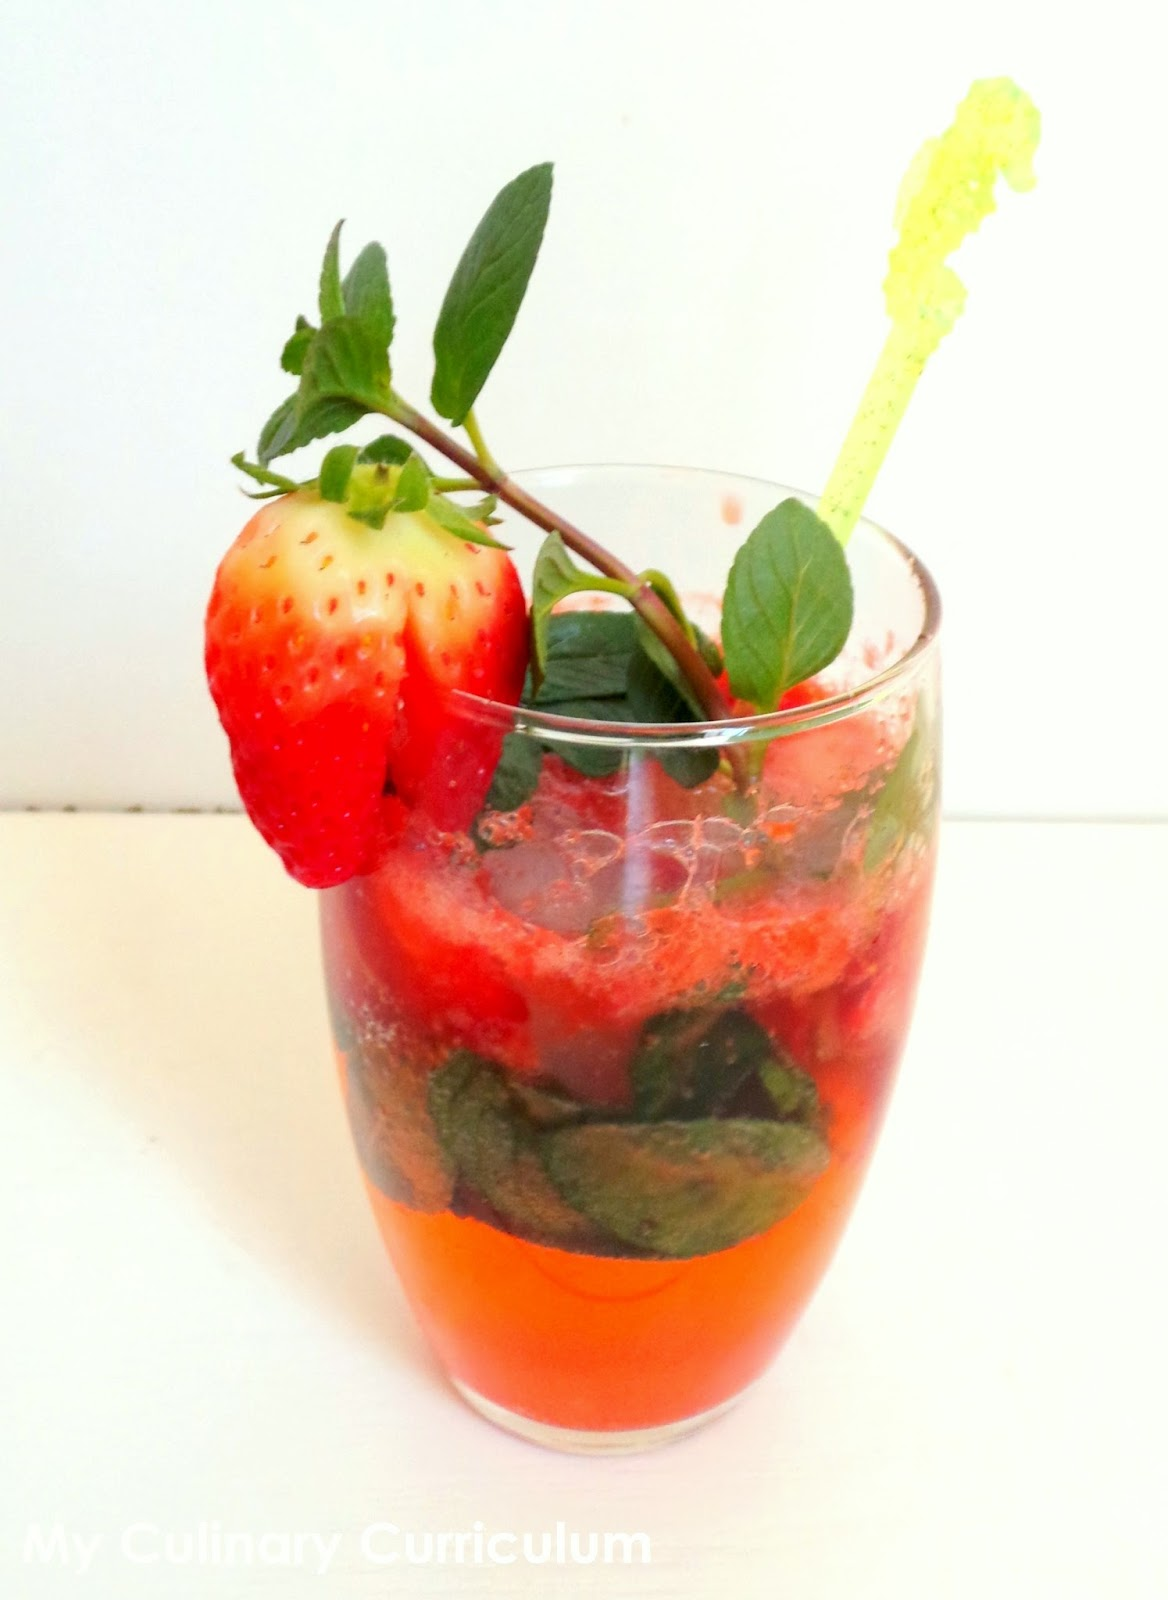 my culinary curriculum virgin mojito la fraise sans alcool strawberry virgin mojito. Black Bedroom Furniture Sets. Home Design Ideas